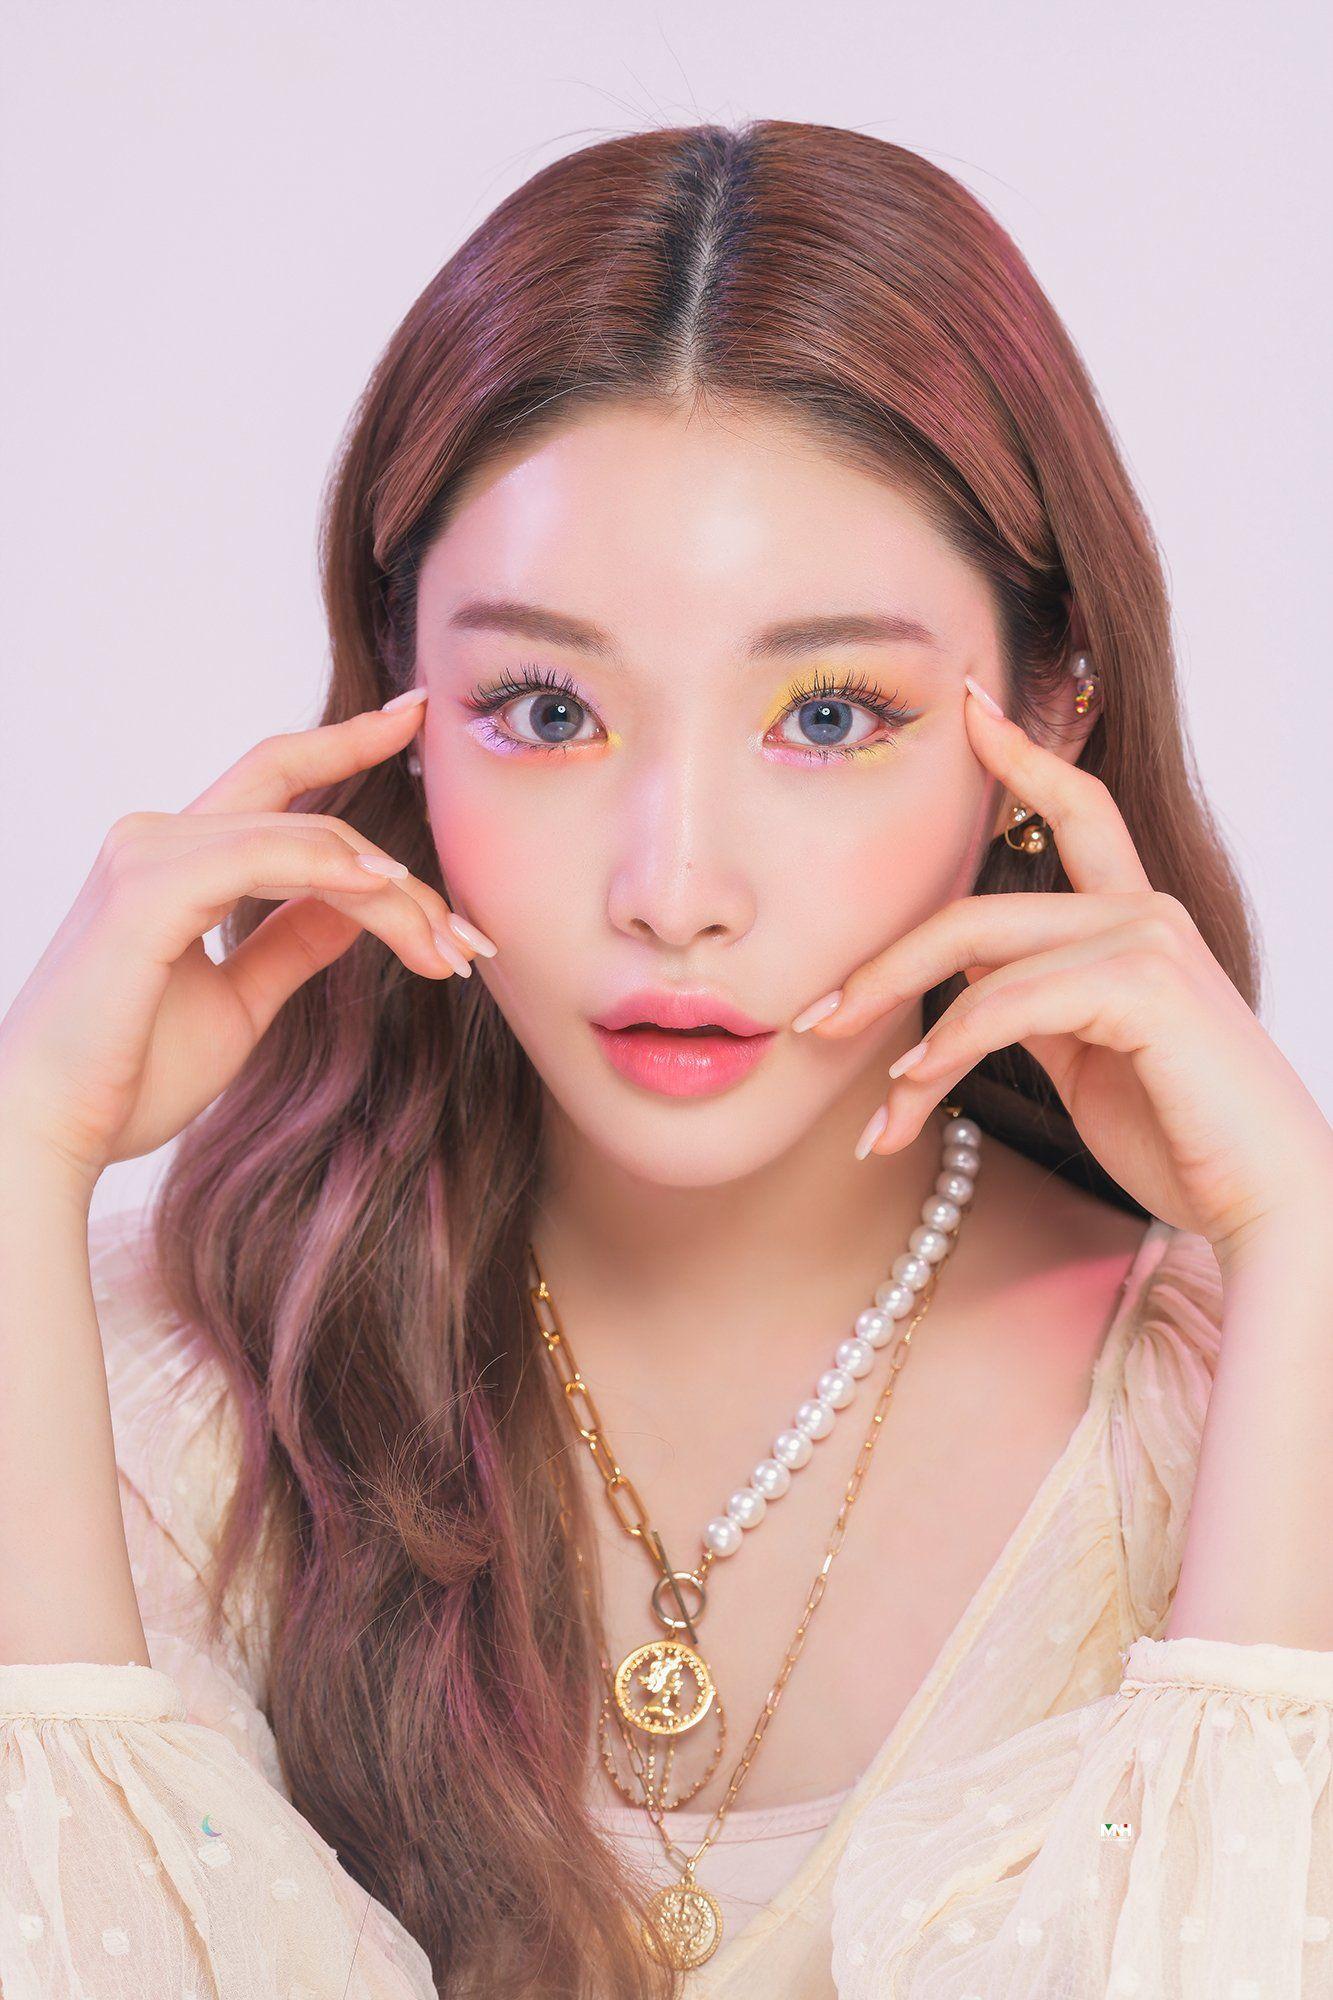 Chung Ha On Twitter Kpop Girls Beauty Girl